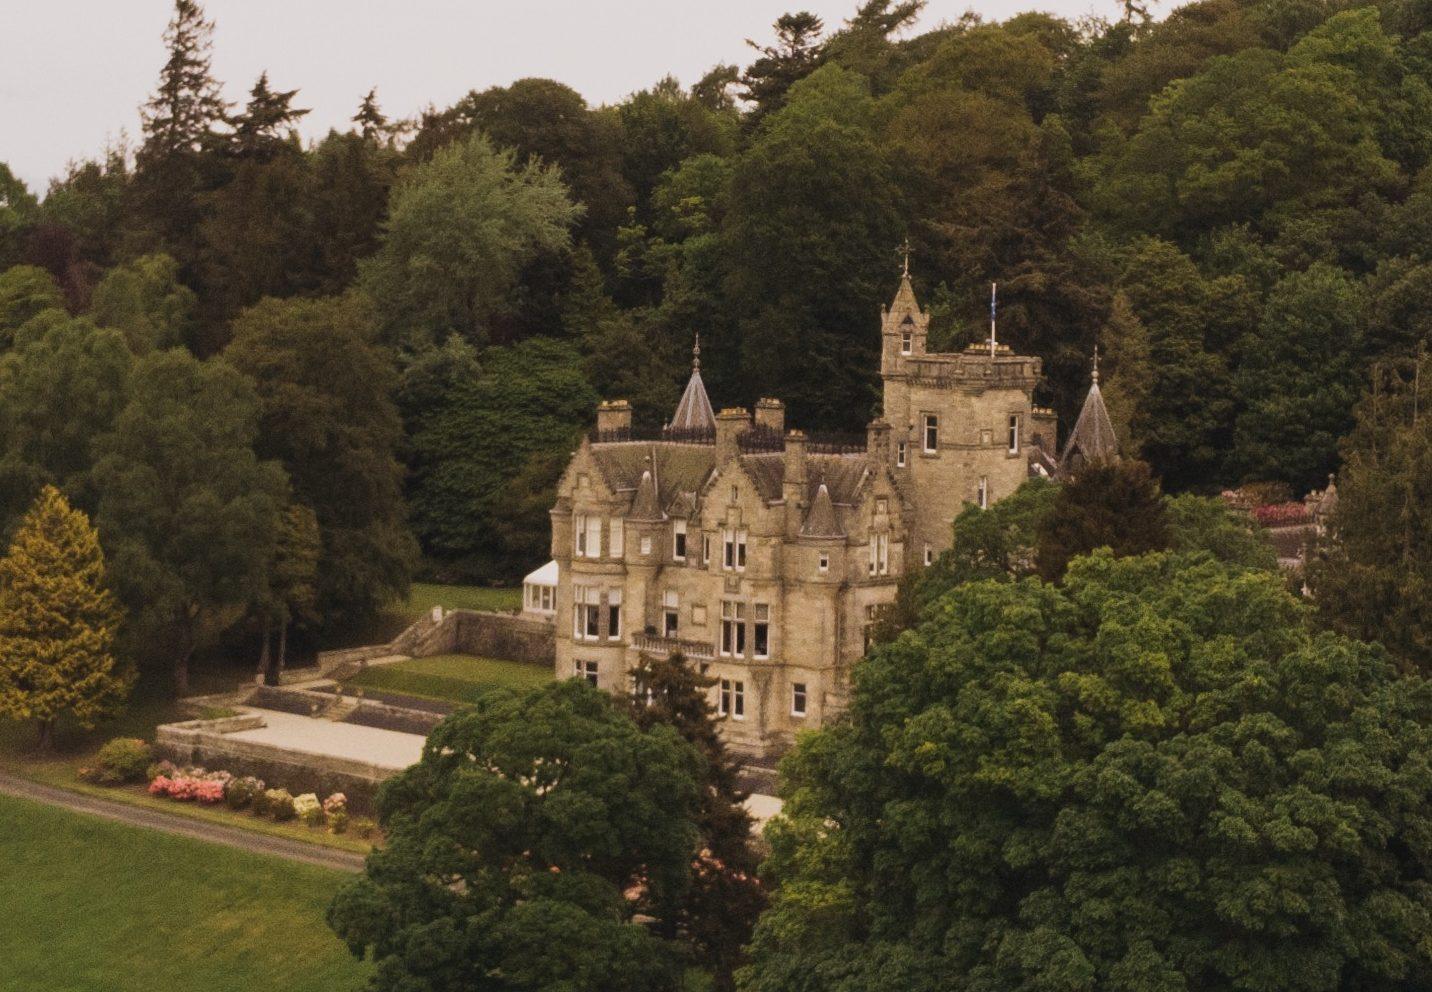 Kinnettles Castle Angus Wedding Venue